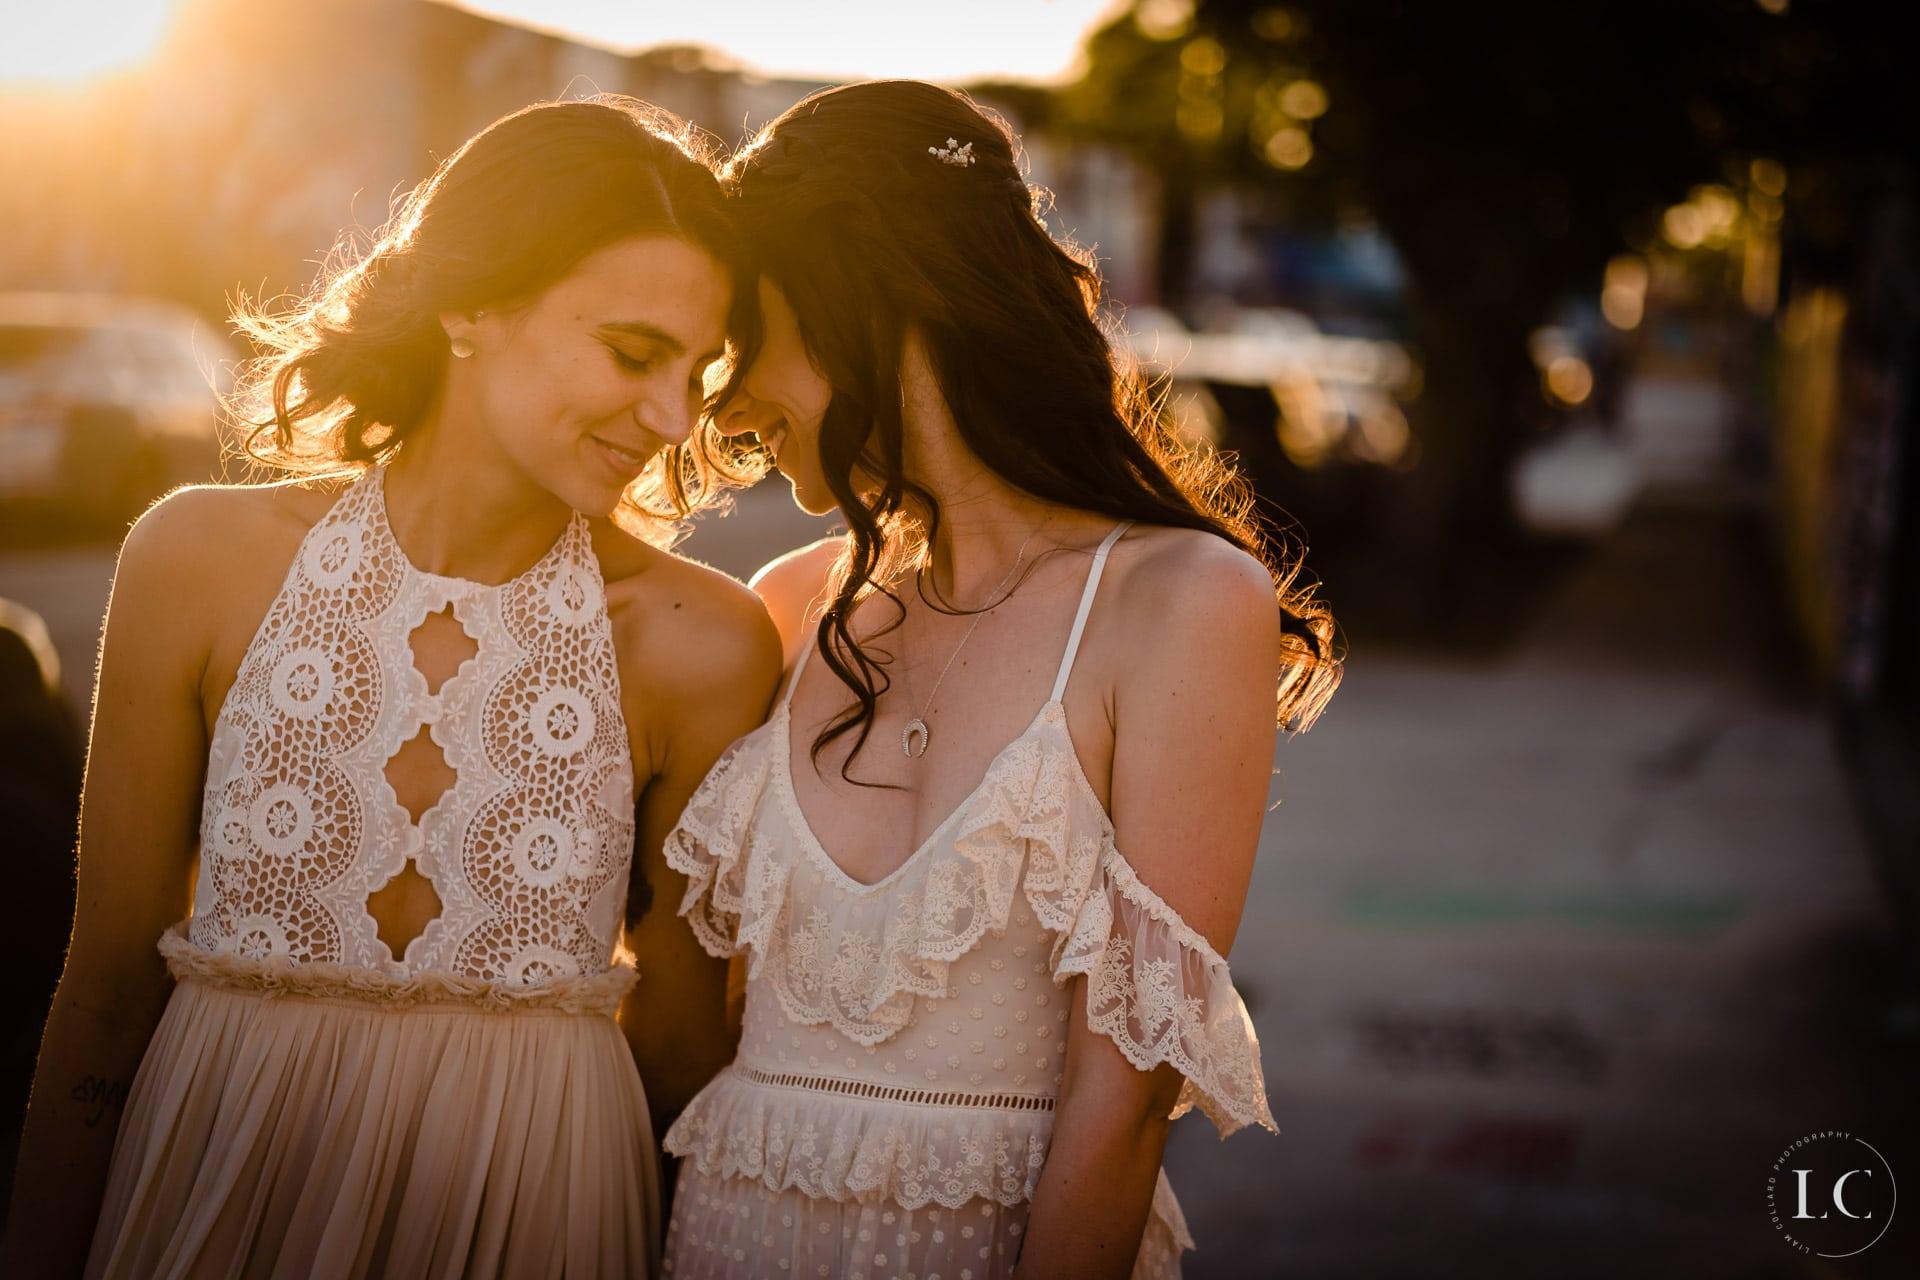 Same sex brides embracing sunset